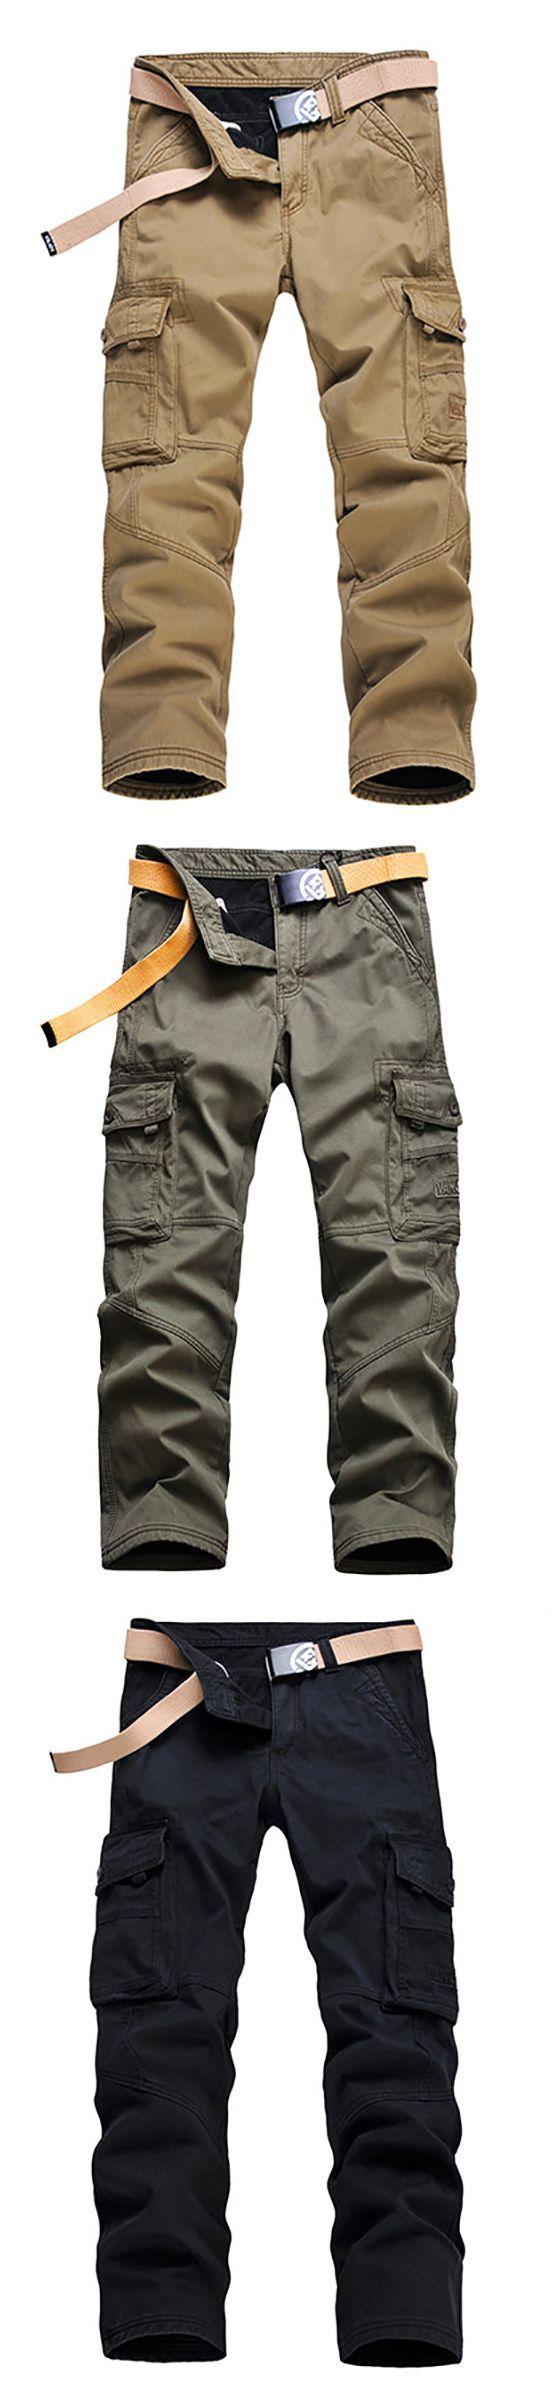 Winter Warm Thick Cargo Pants/Fleece Lined Casual Trouser #men #menswear #menoutfits